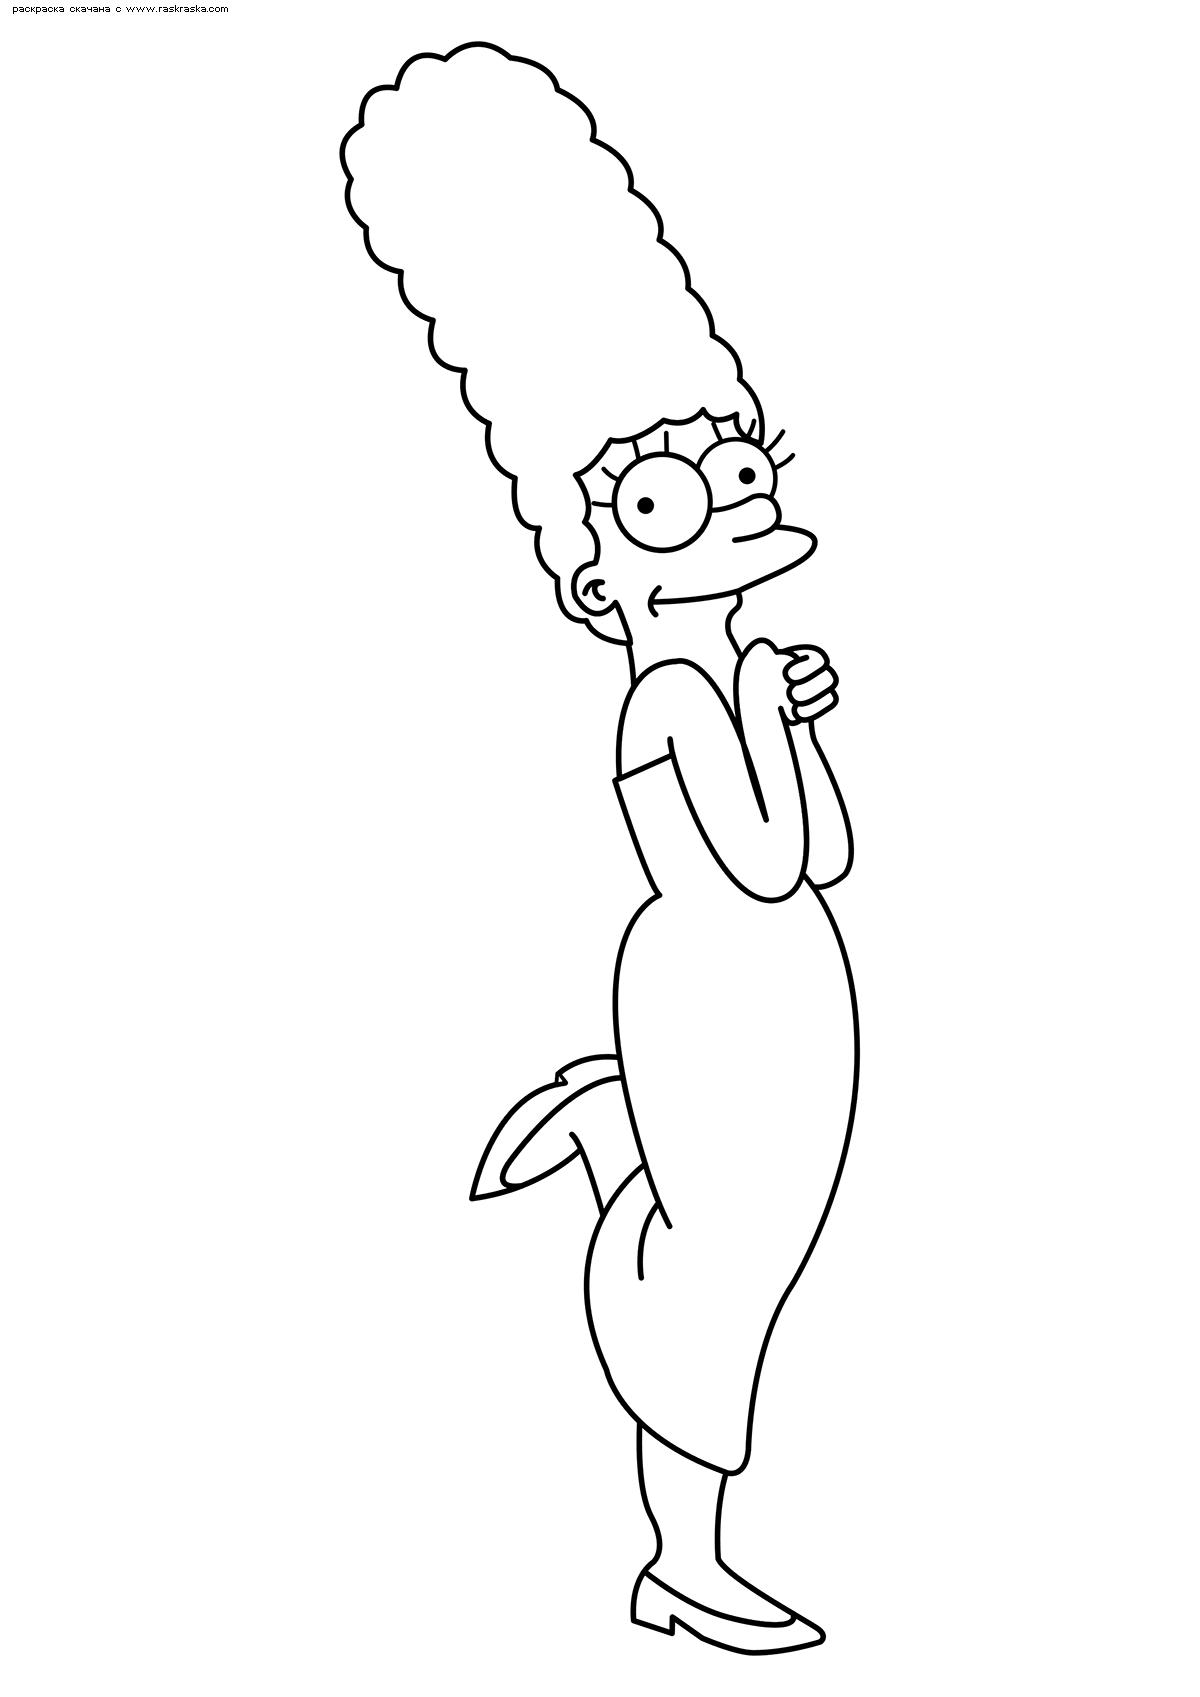 Раскраска Мардж Симпсон. Раскраска Симпсоны